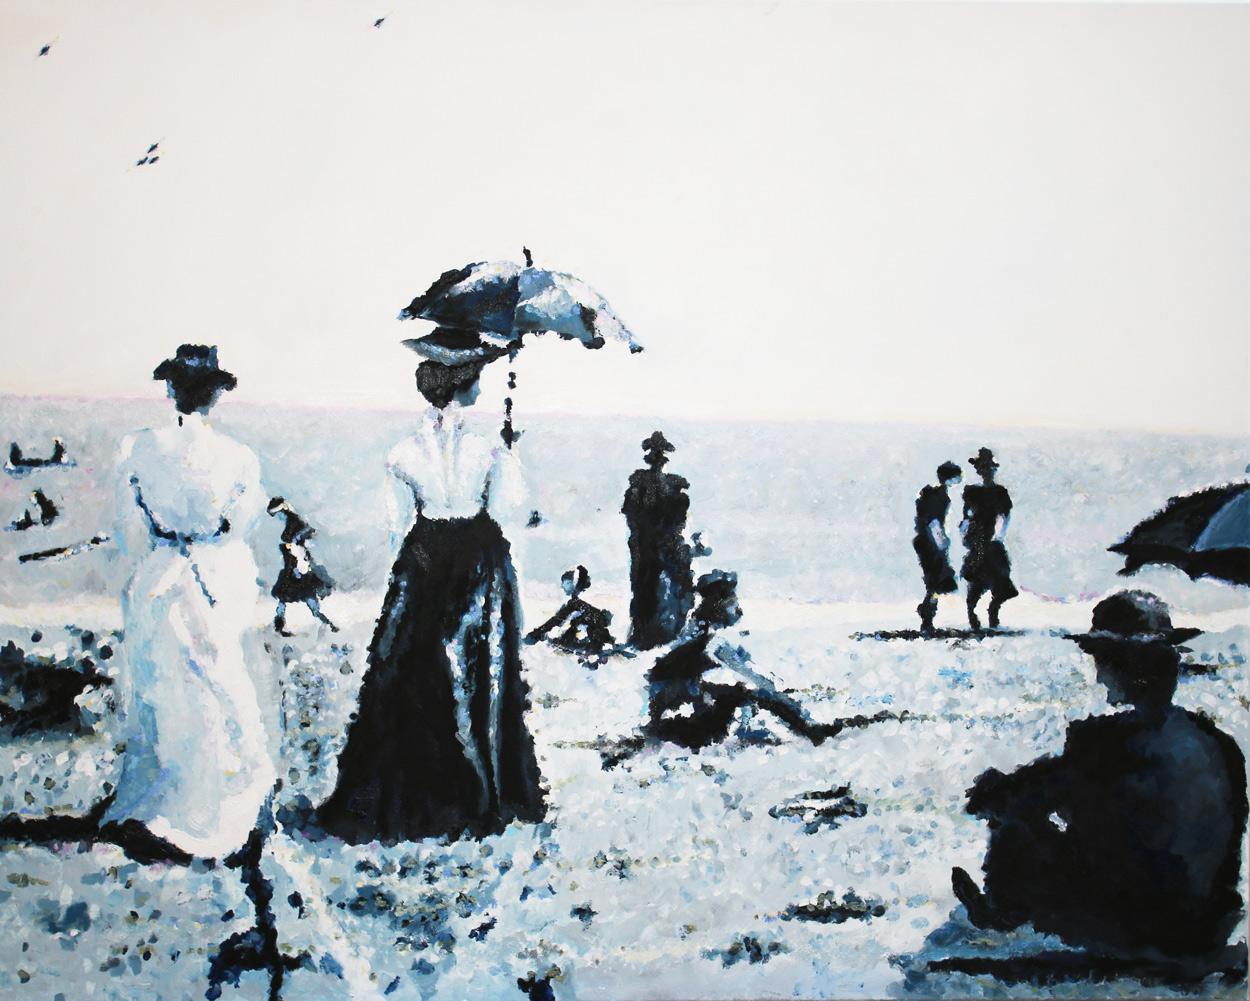 Mesdames sur mer, 2018, Öl auf Leinwand, 80 x 100 cm